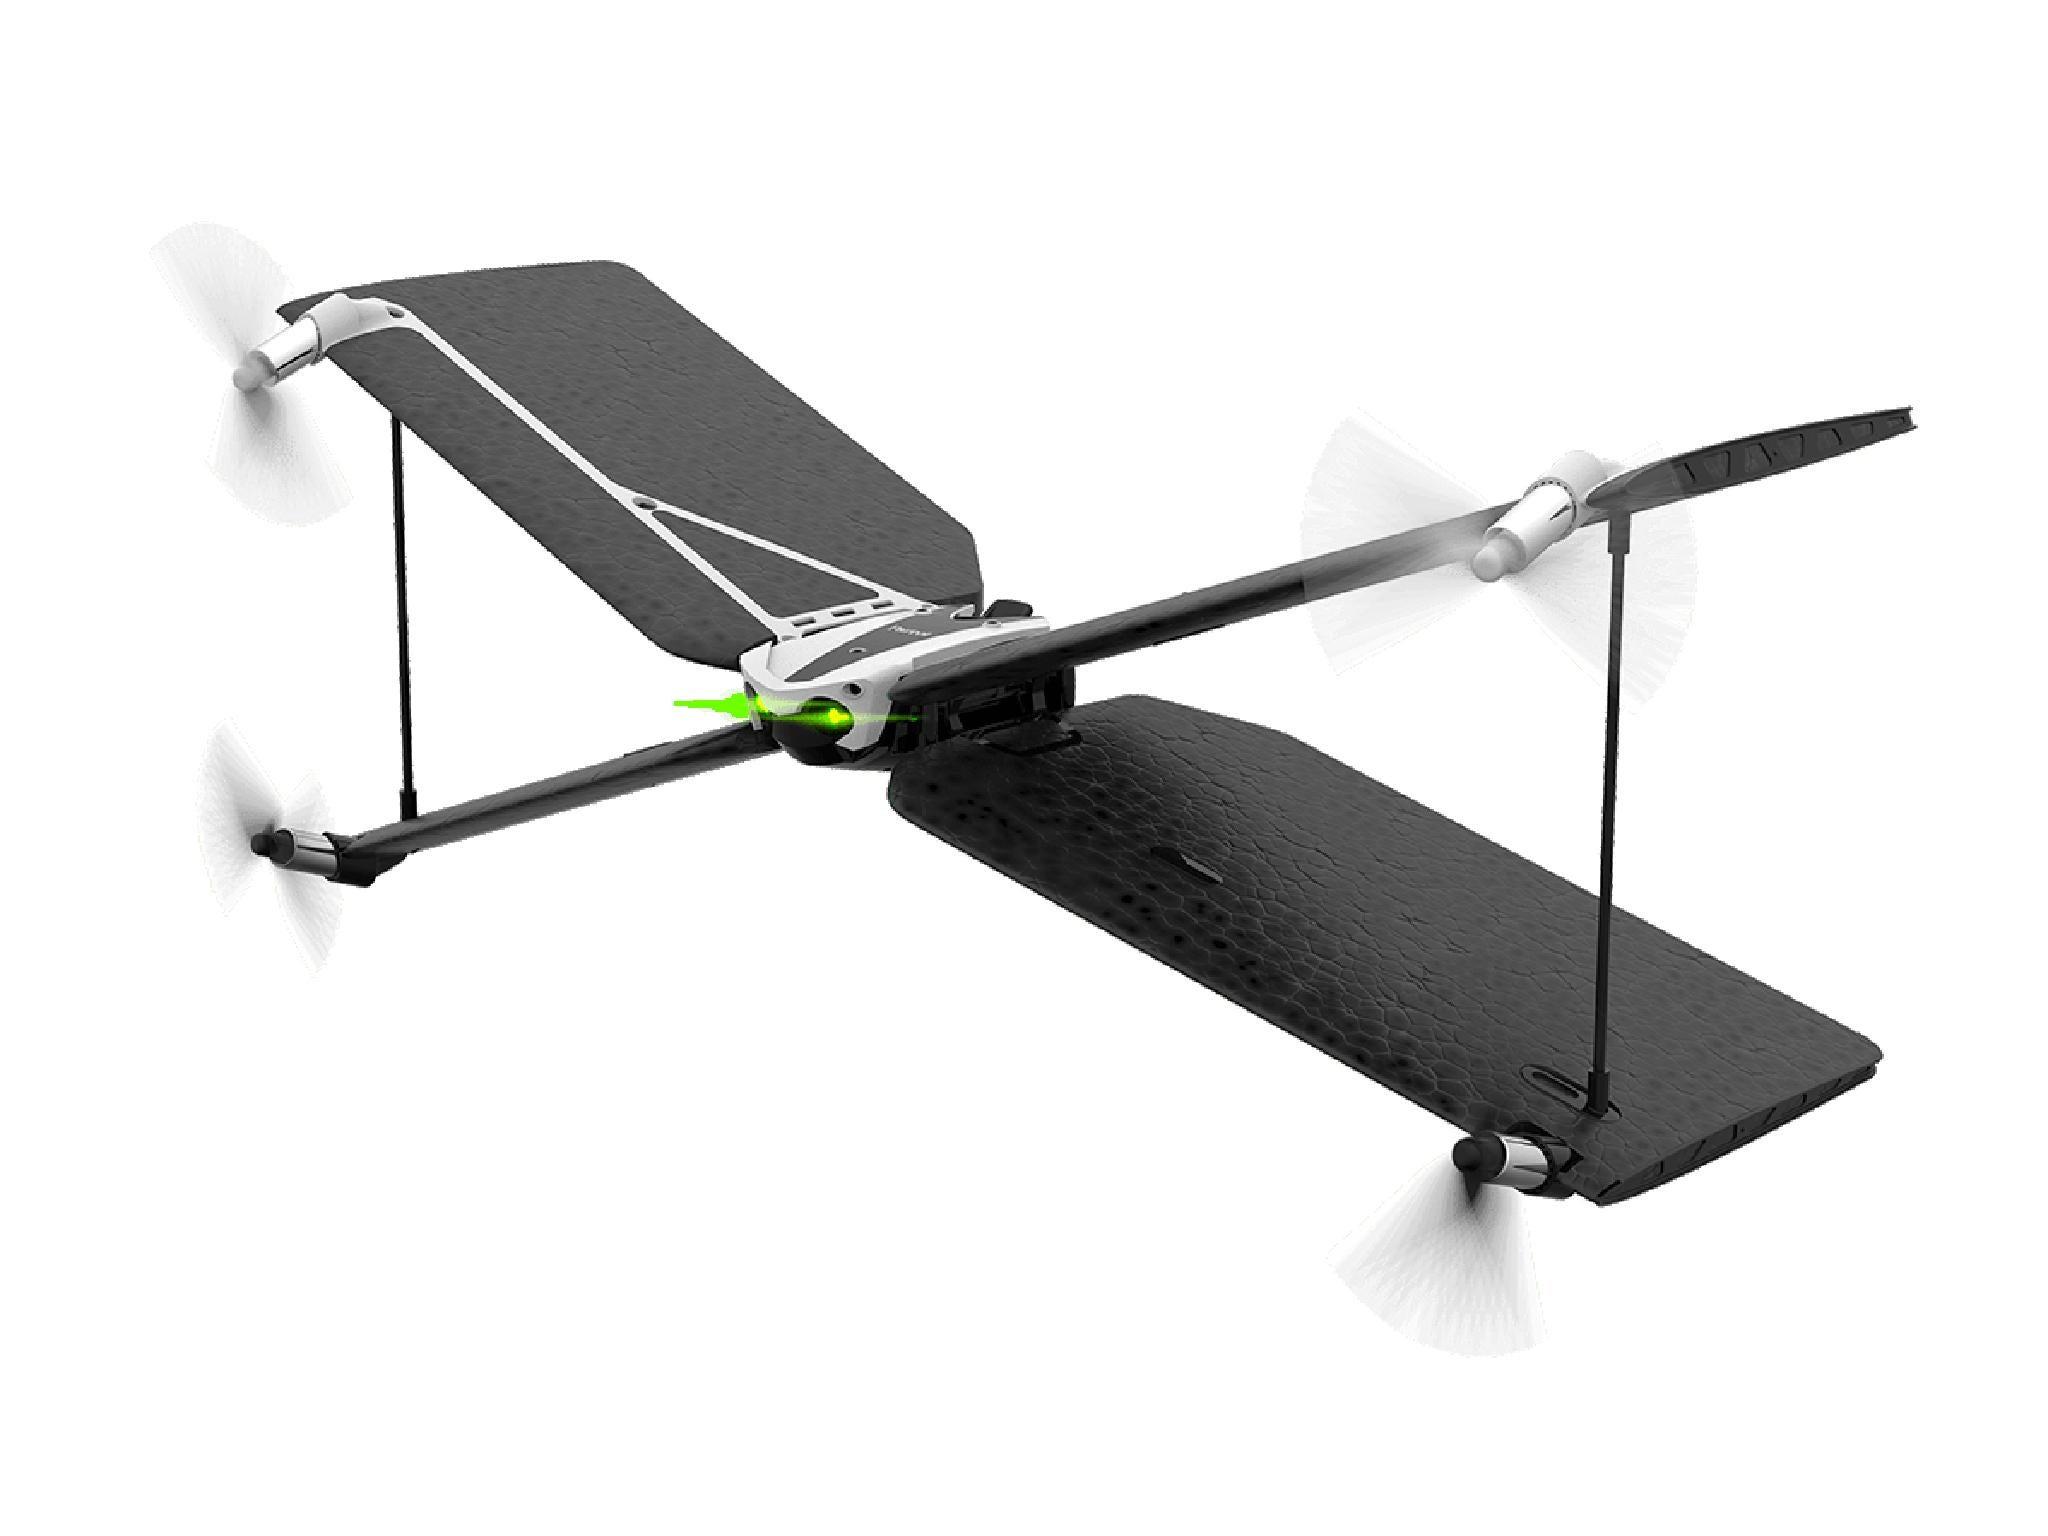 11 best drones | The Independent